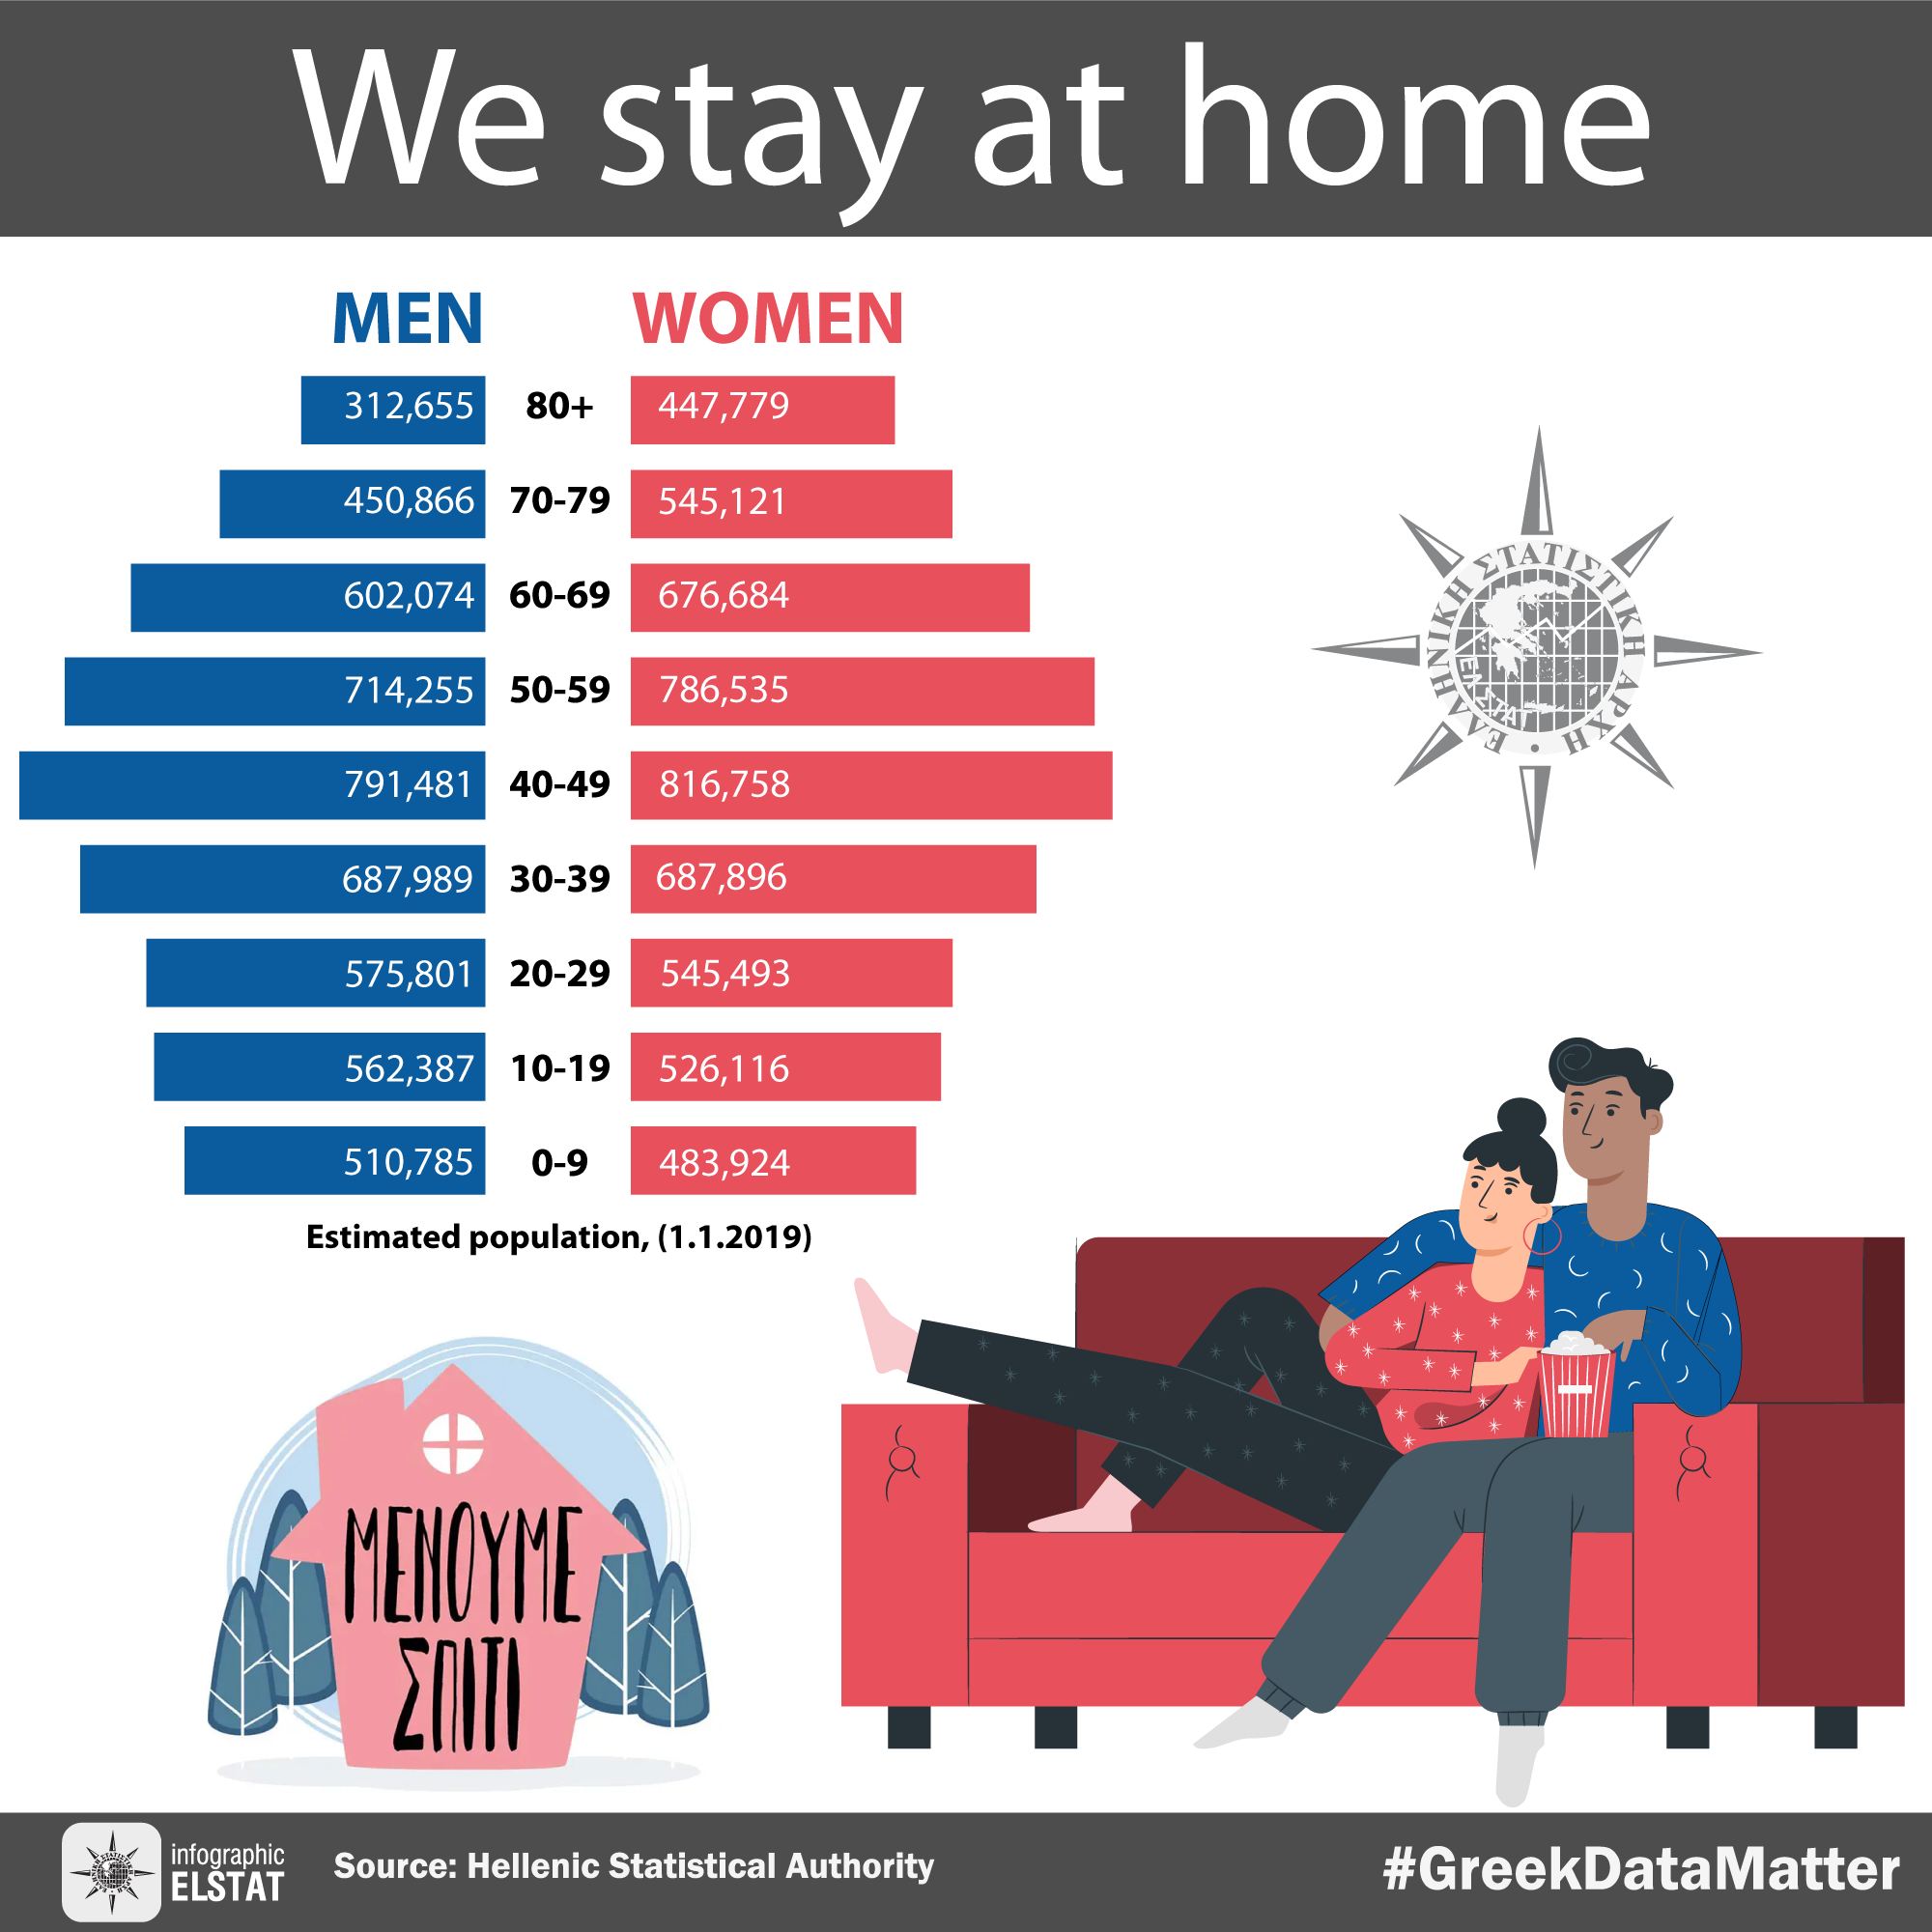 infographic-menoume-spiti-1 en